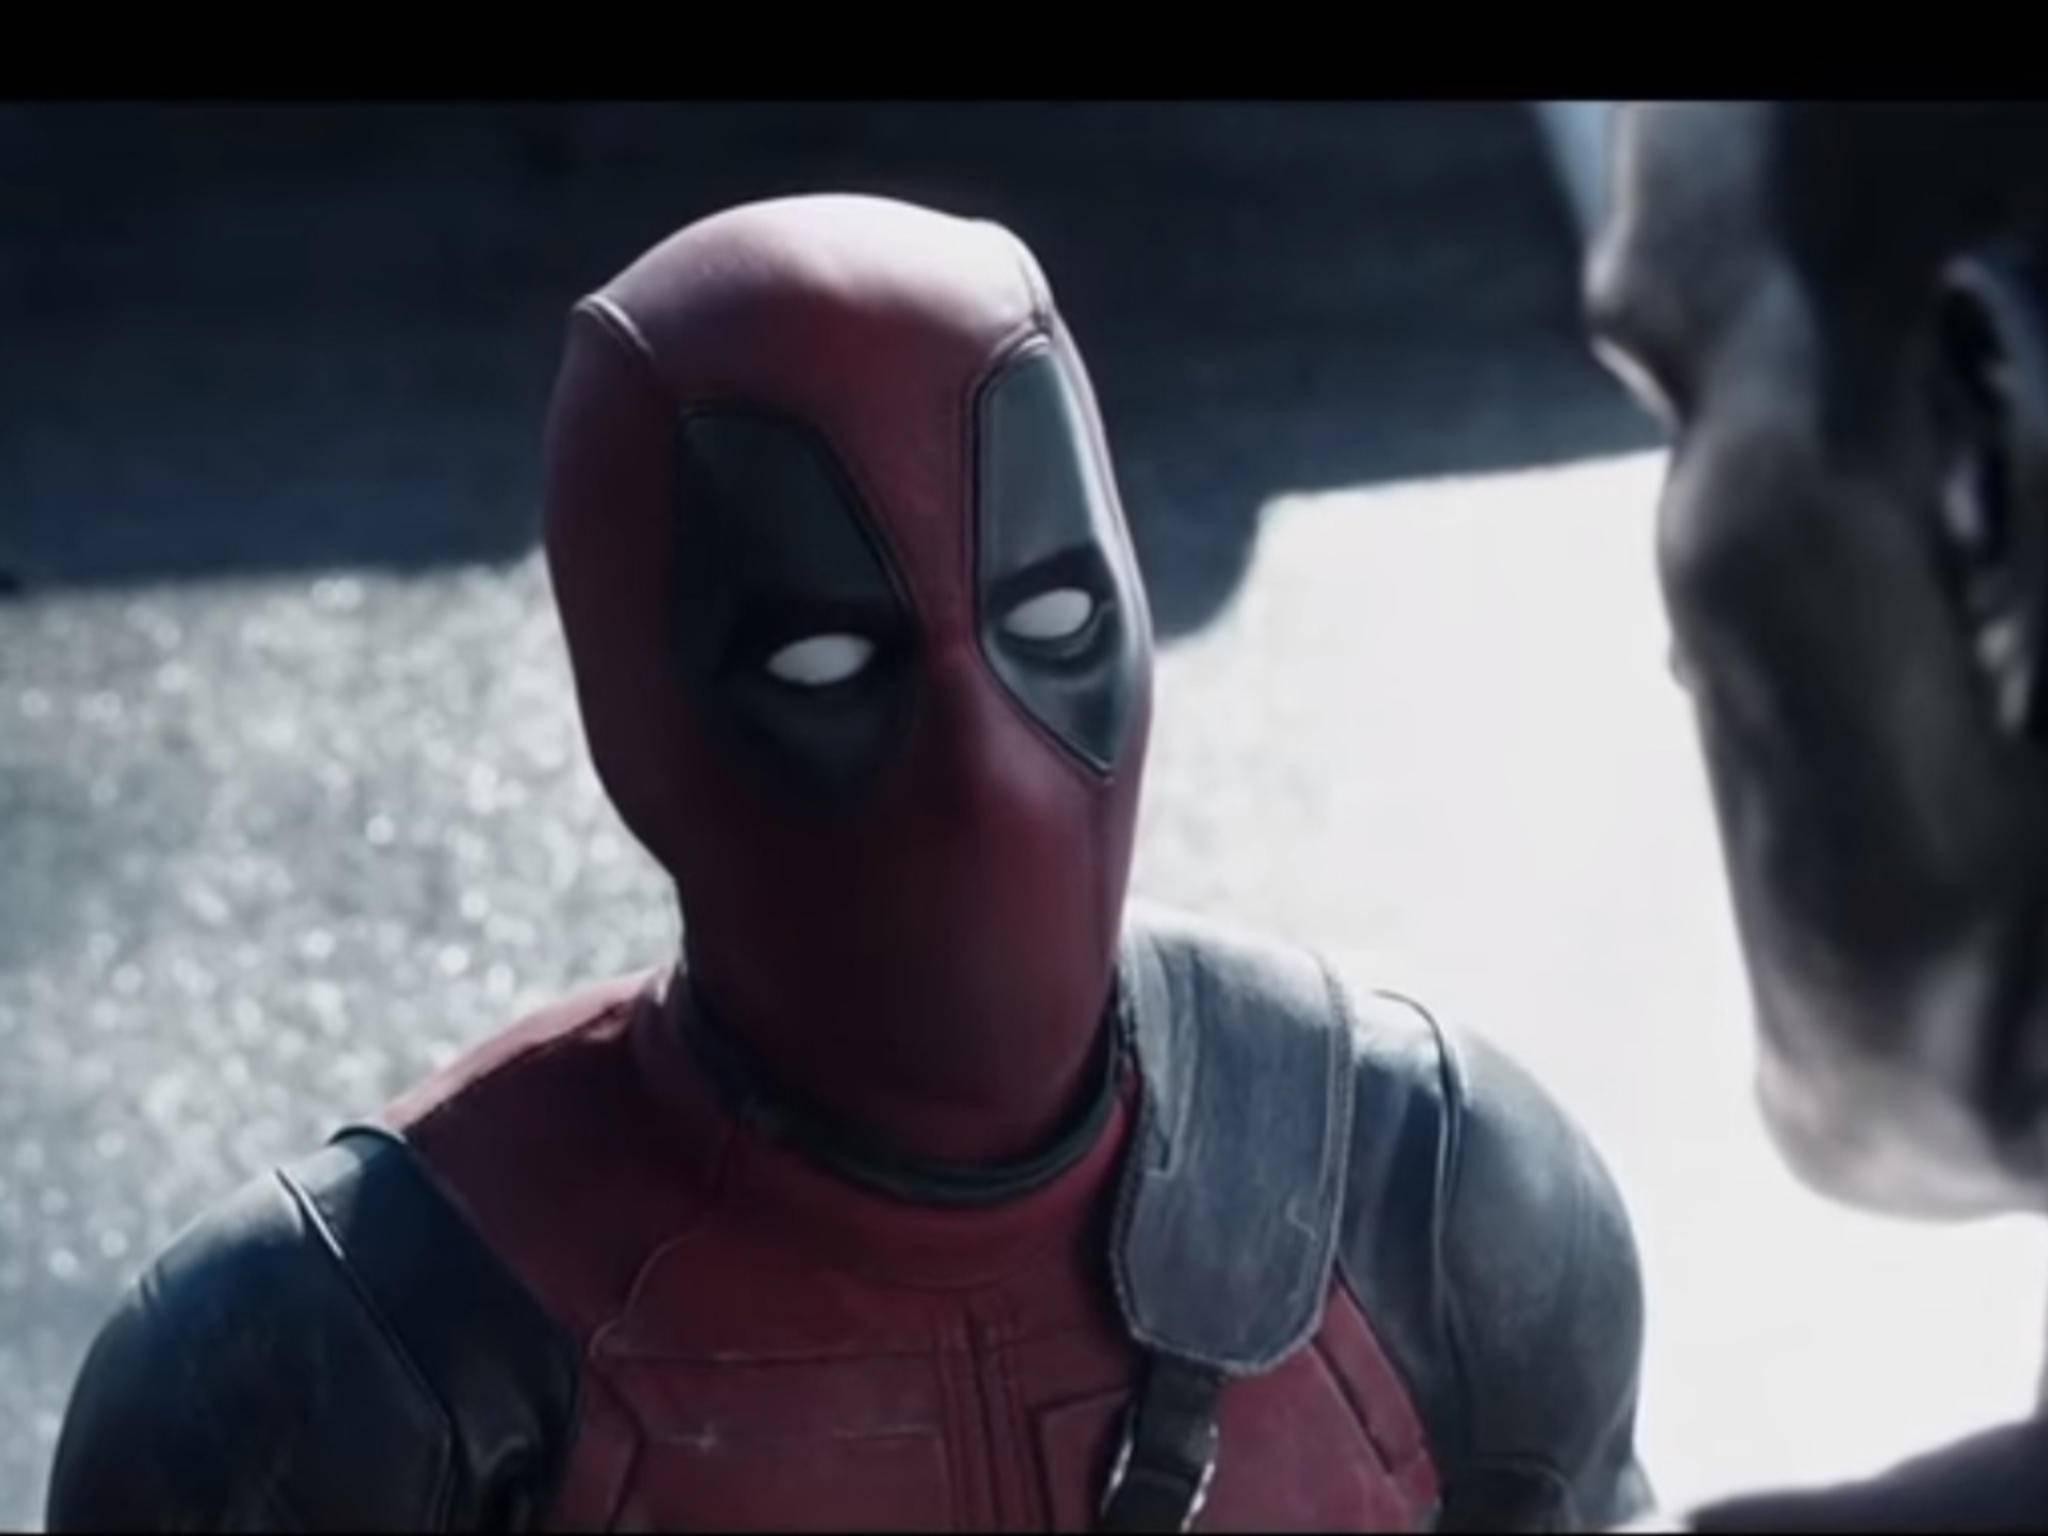 Kein Mund, trotzdem große Klappe: Deadpool